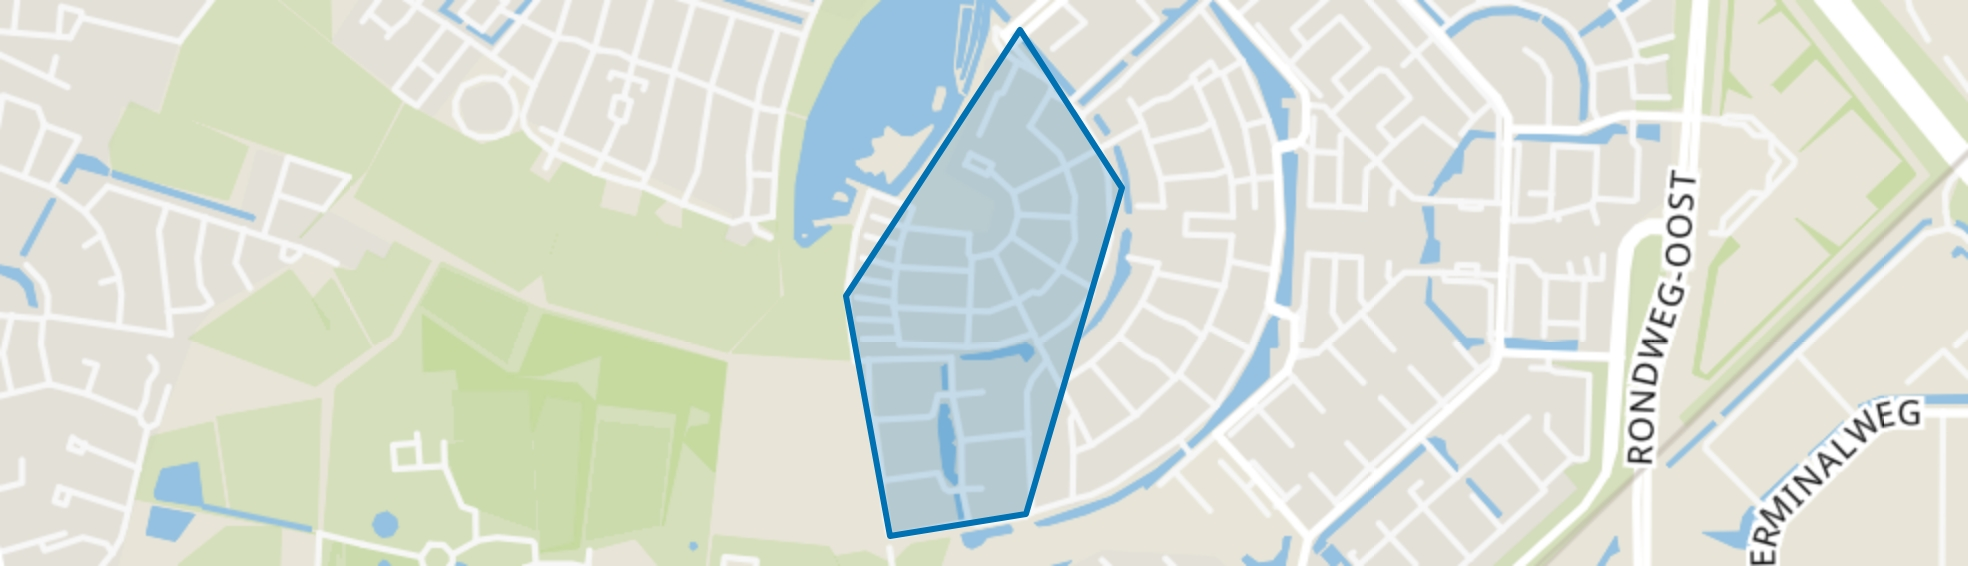 Architectenbuurt-West, Amersfoort map